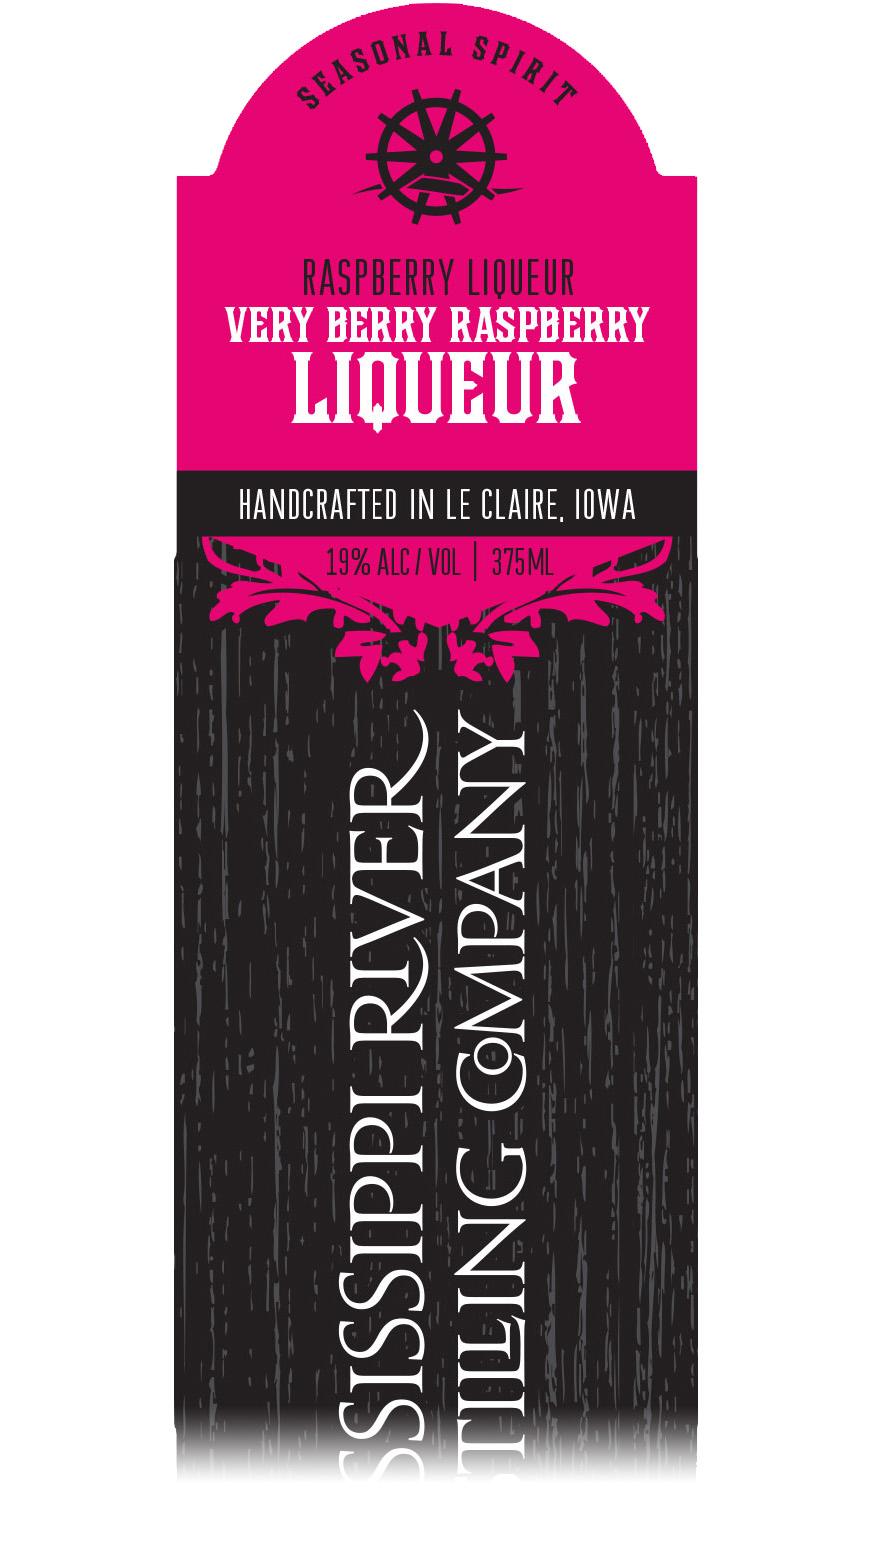 Very Berry Raspberry Liqueur label